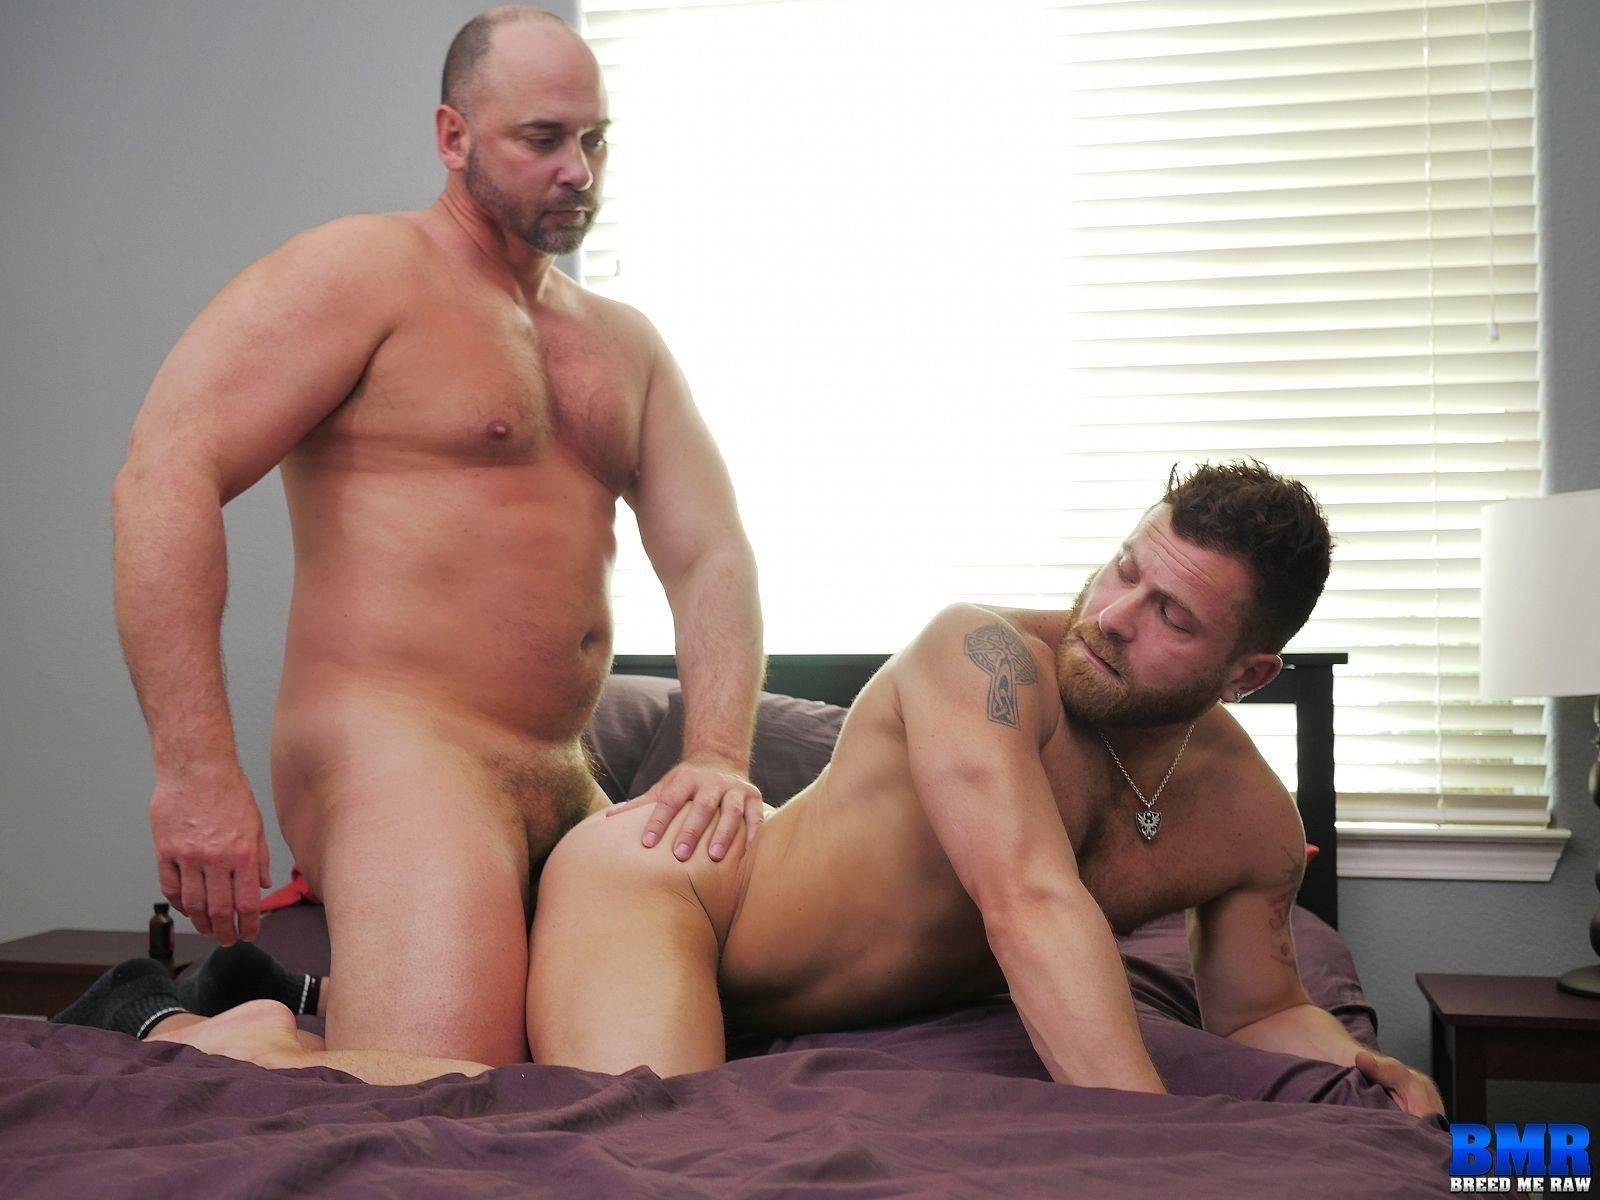 Actor Porno Specen Reed daddy tyler reed fucks beefy bear riley mitchel | gay